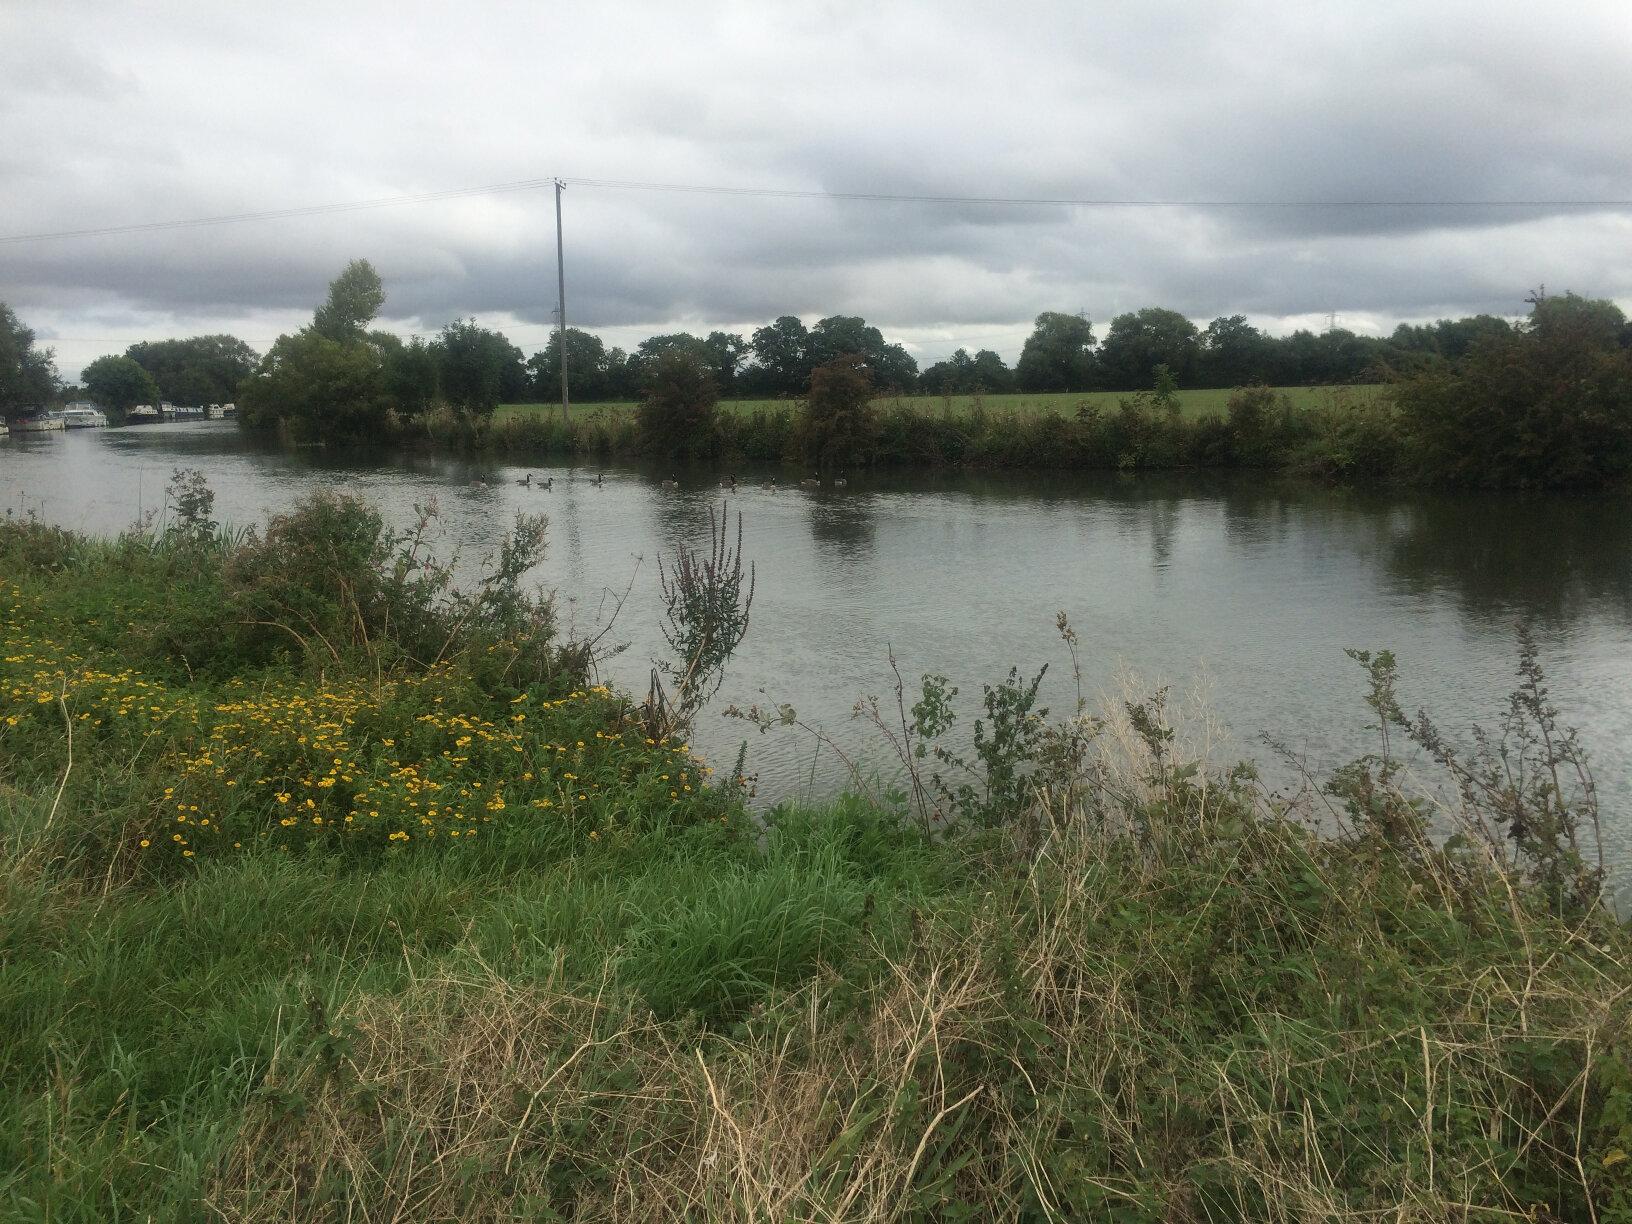 From Lechlade to Newbridge (29)